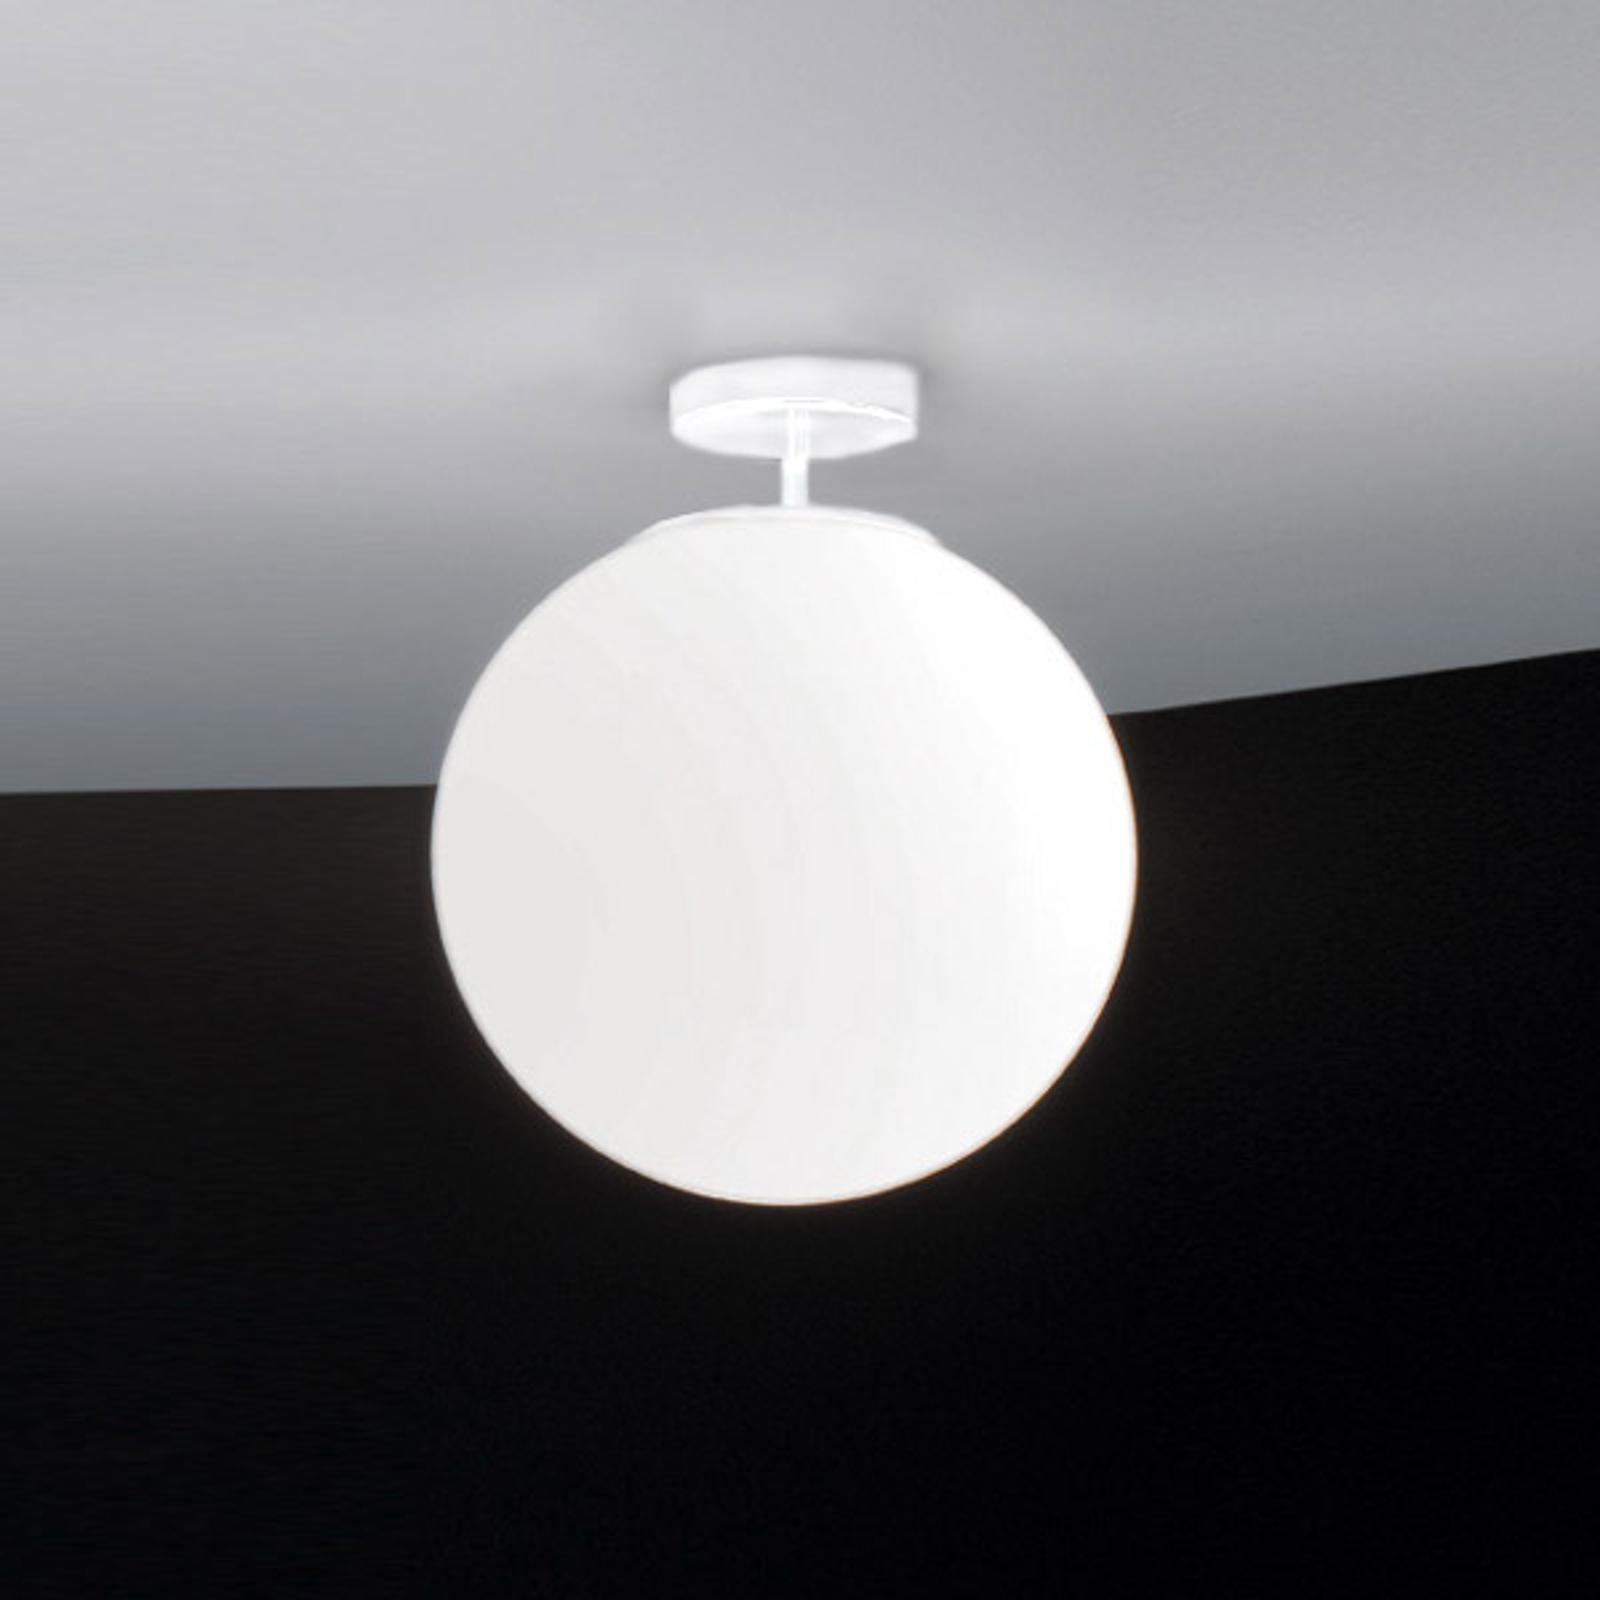 Sferis loftlampe i glas, 30 cm, hvid